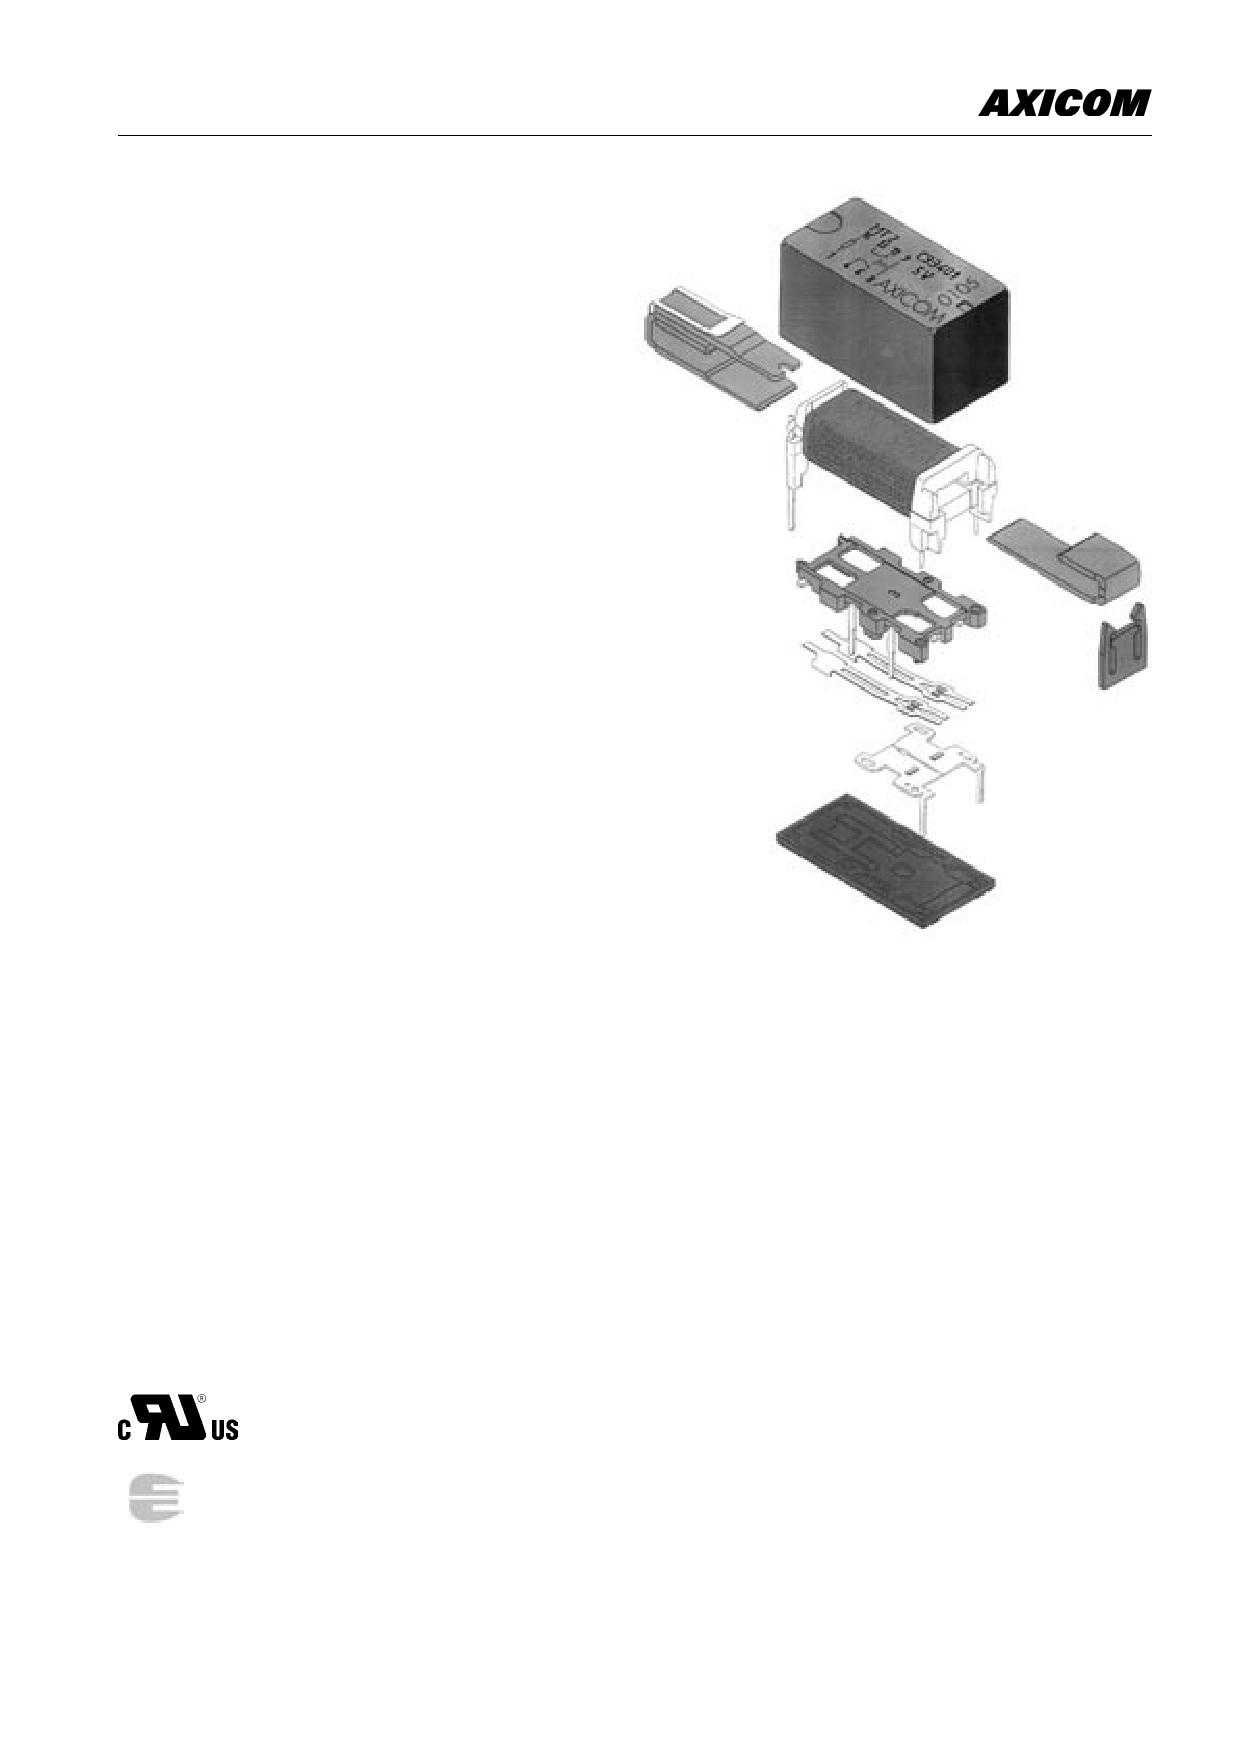 6-1462000-8 Даташит, Описание, Даташиты